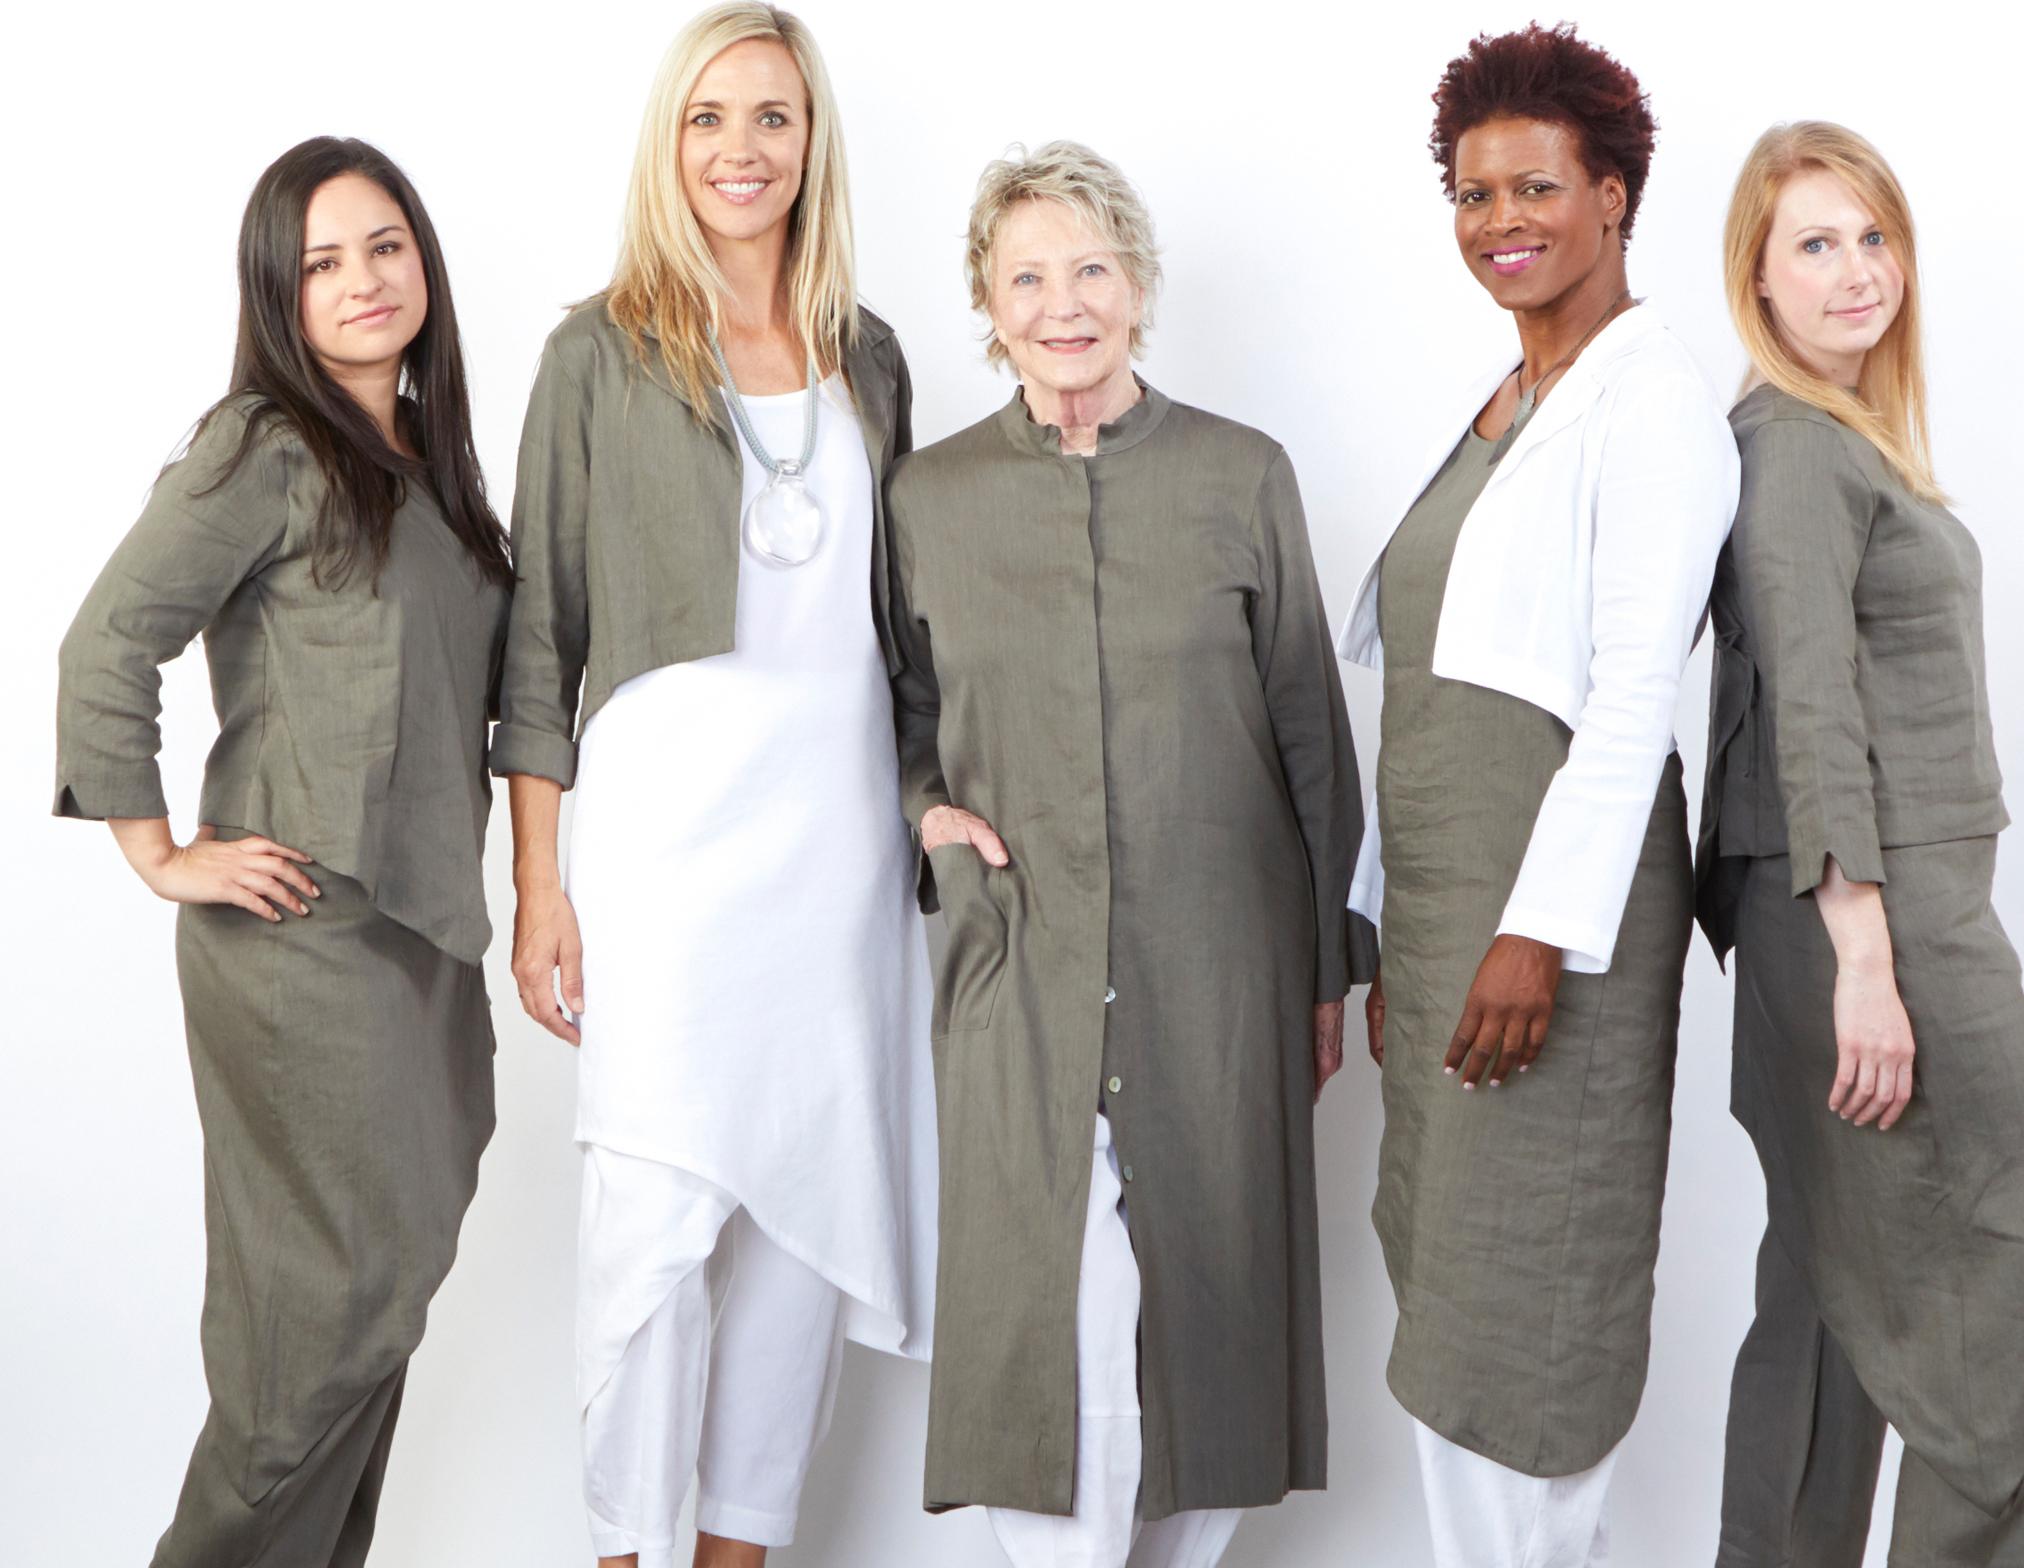 Hathaway Jacket, Euna Dress, Sofia Pant, Oliver Pant in White, Mia Shirt, Euna Dress, Sofia Pant, Hathaway Jacket, Hall Jacket in Torre Ready for Bologna